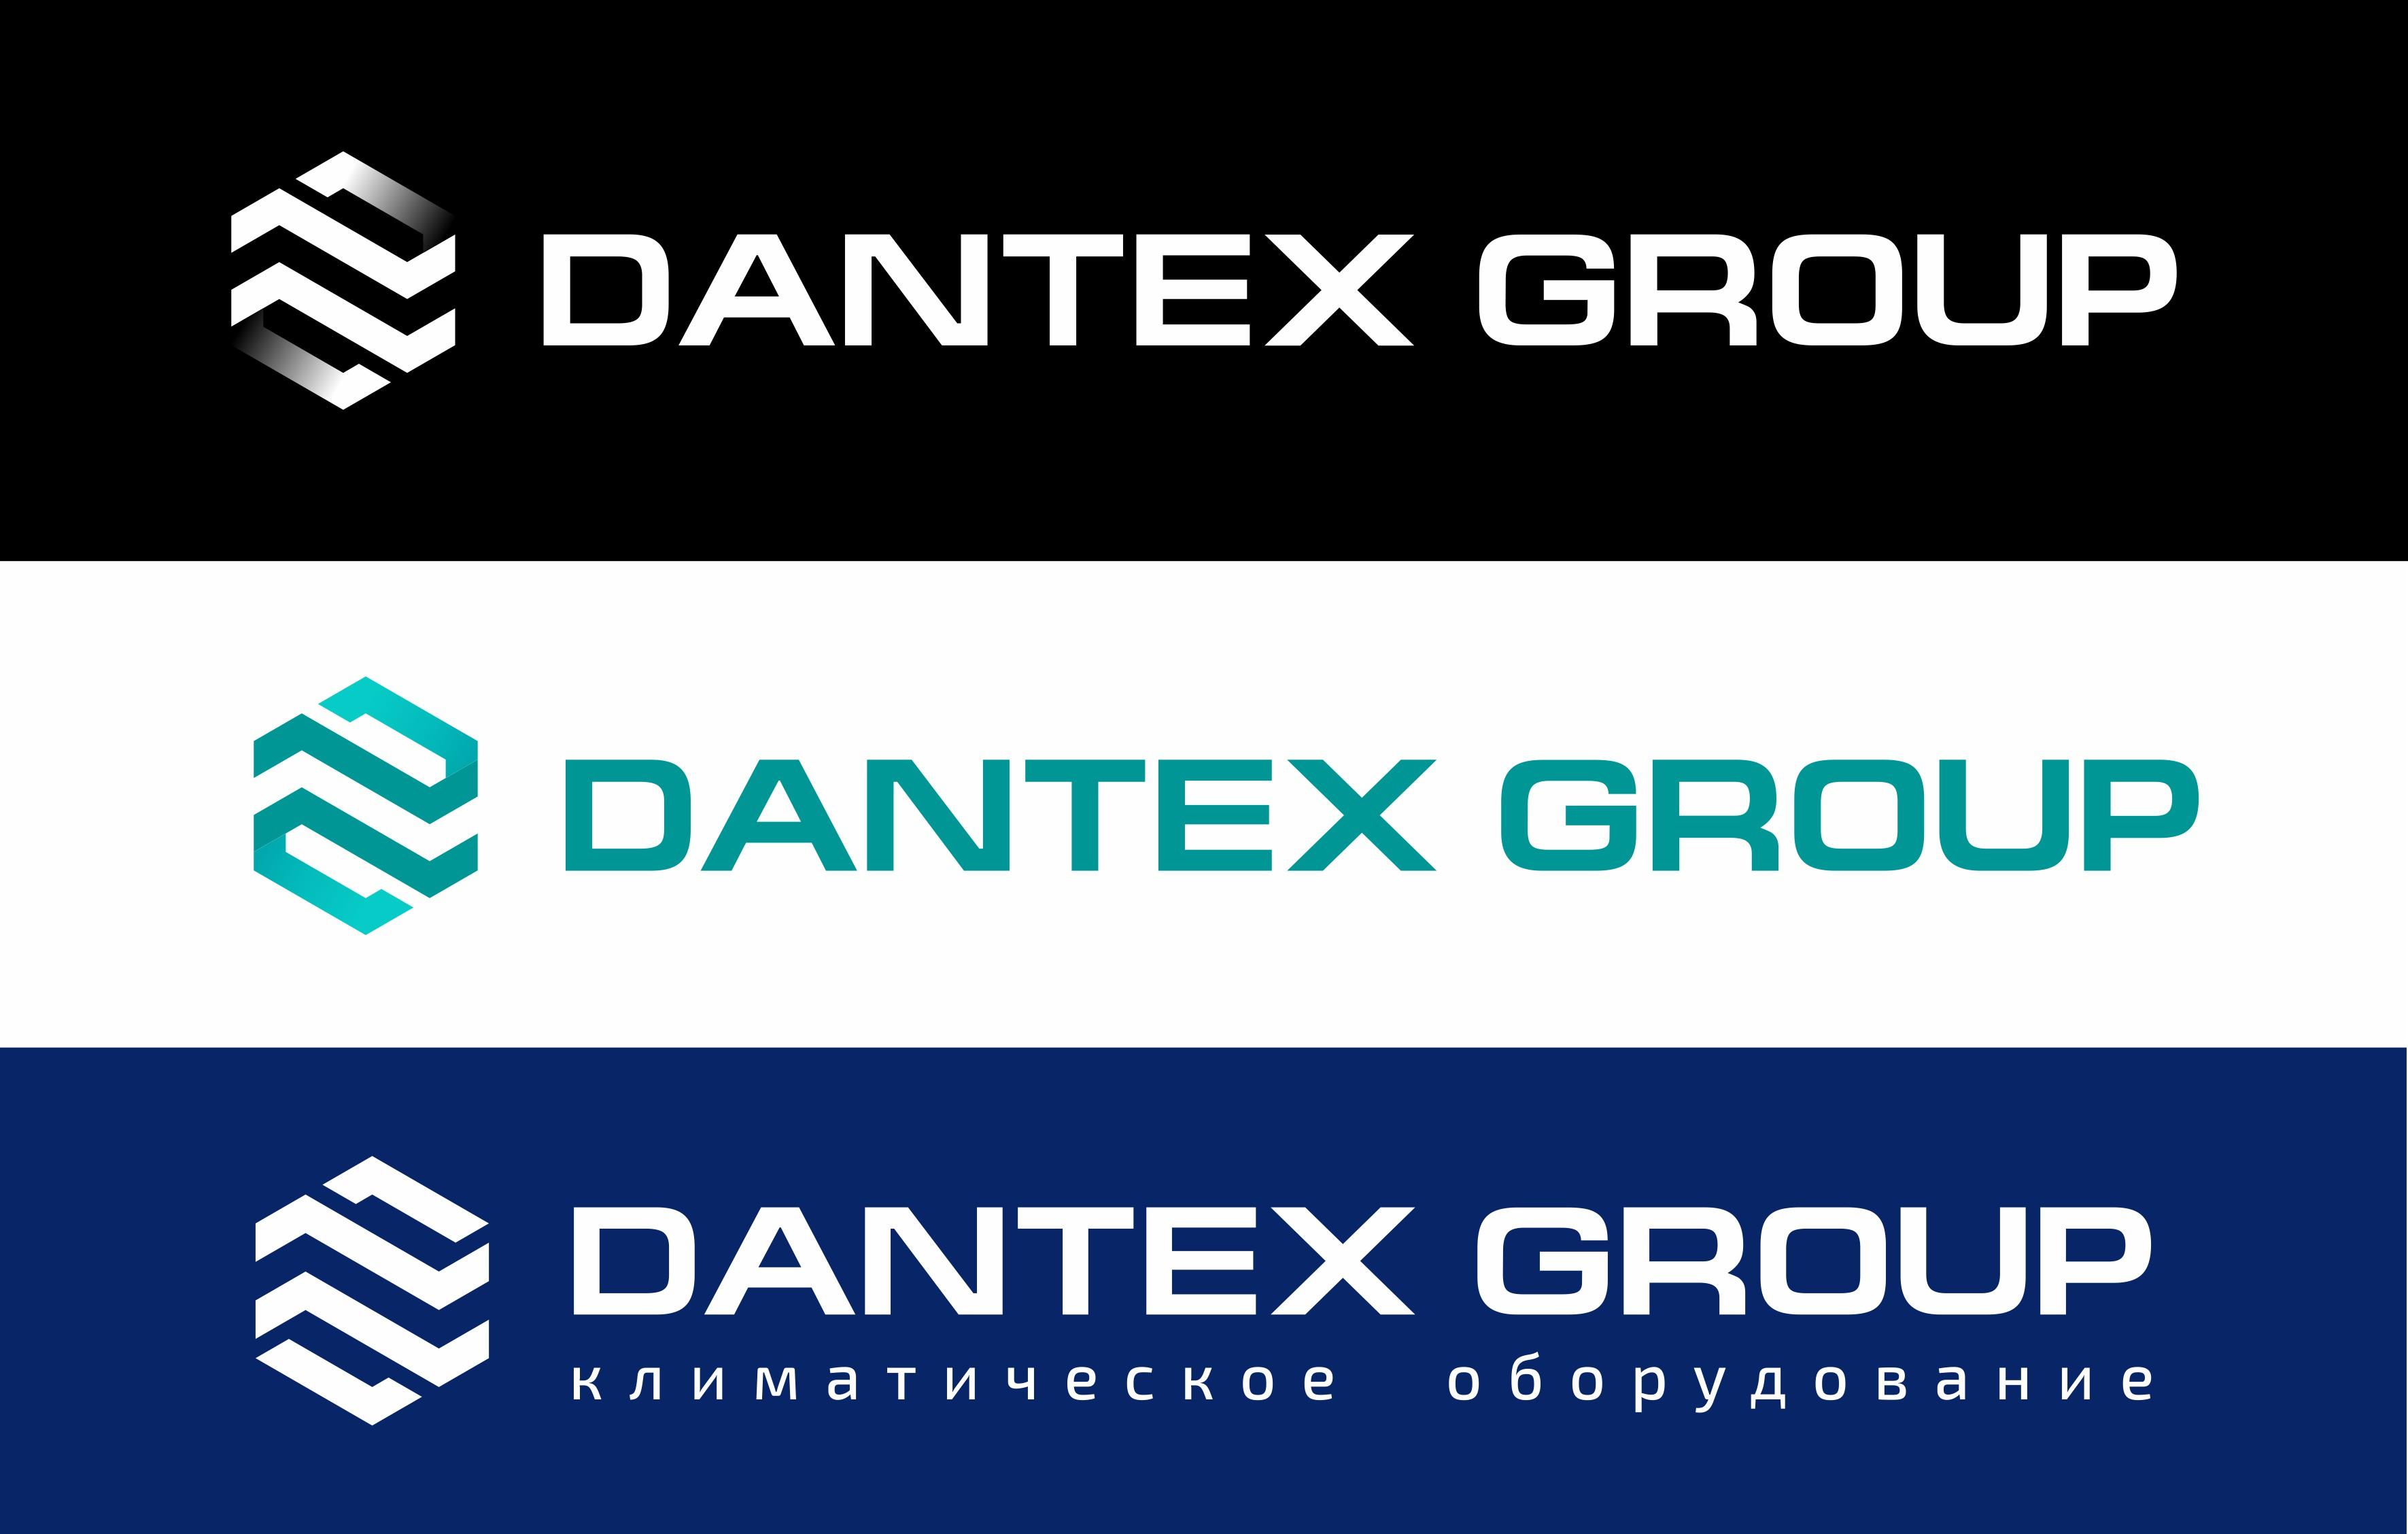 Конкурс на разработку логотипа для компании Dantex Group  фото f_7985bffe70a41d7c.jpg